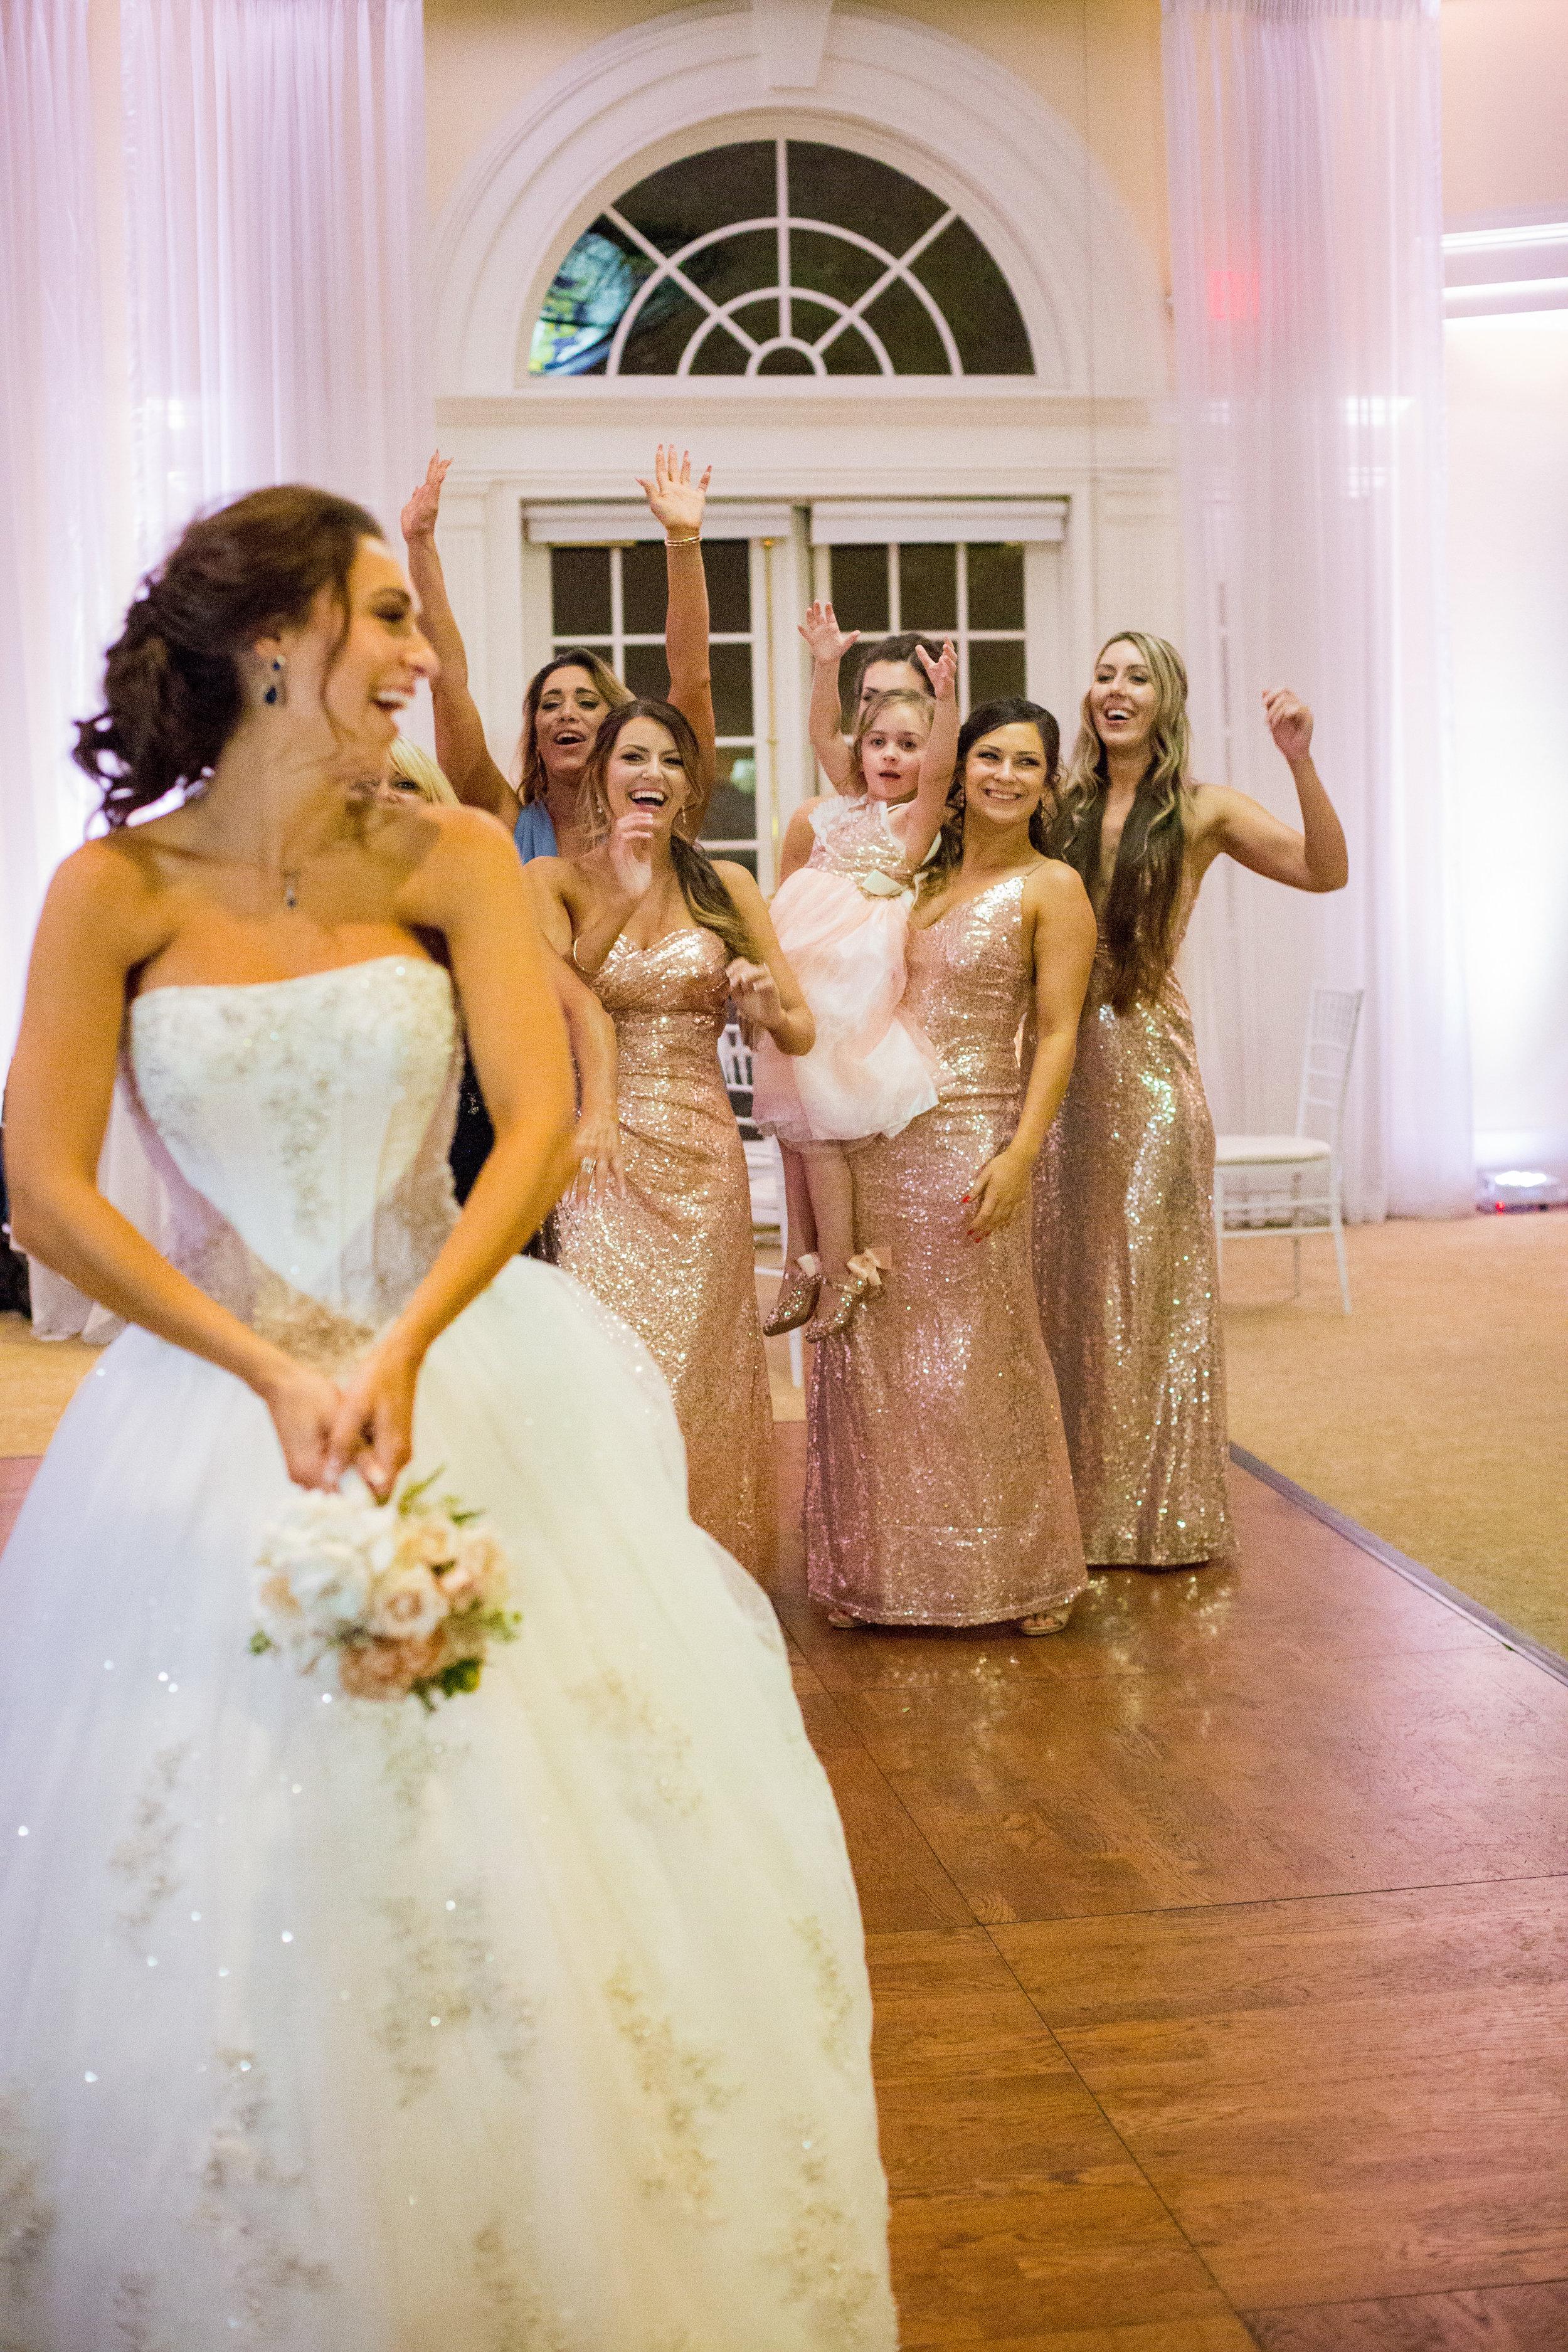 z Vizcaya Sacramento - Kaylie & Trevor - Sacramento Wedding Photographer - Ashley Teasley Photography (130 of 167).jpg